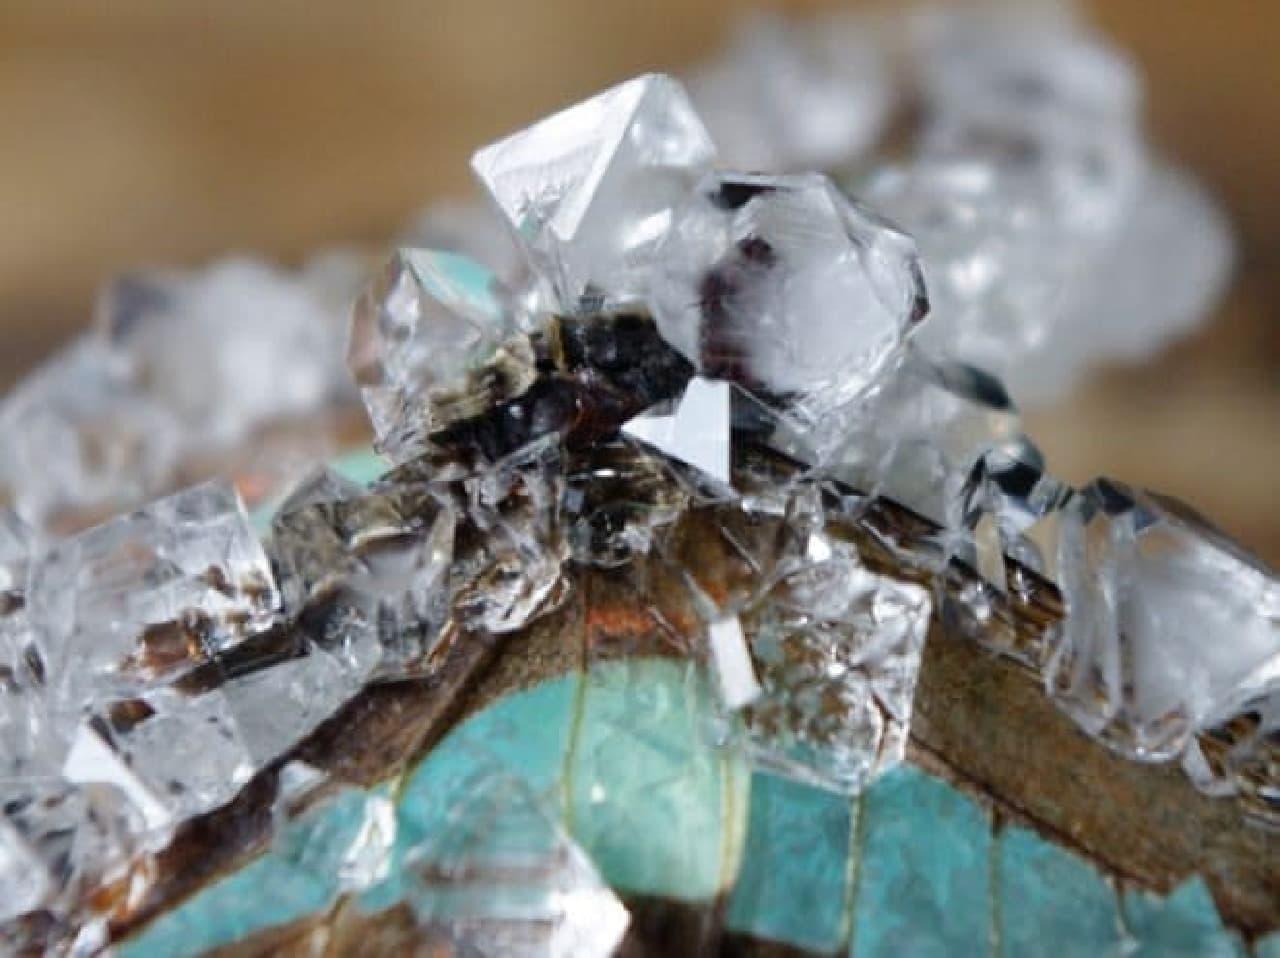 昆虫結晶標本の写真